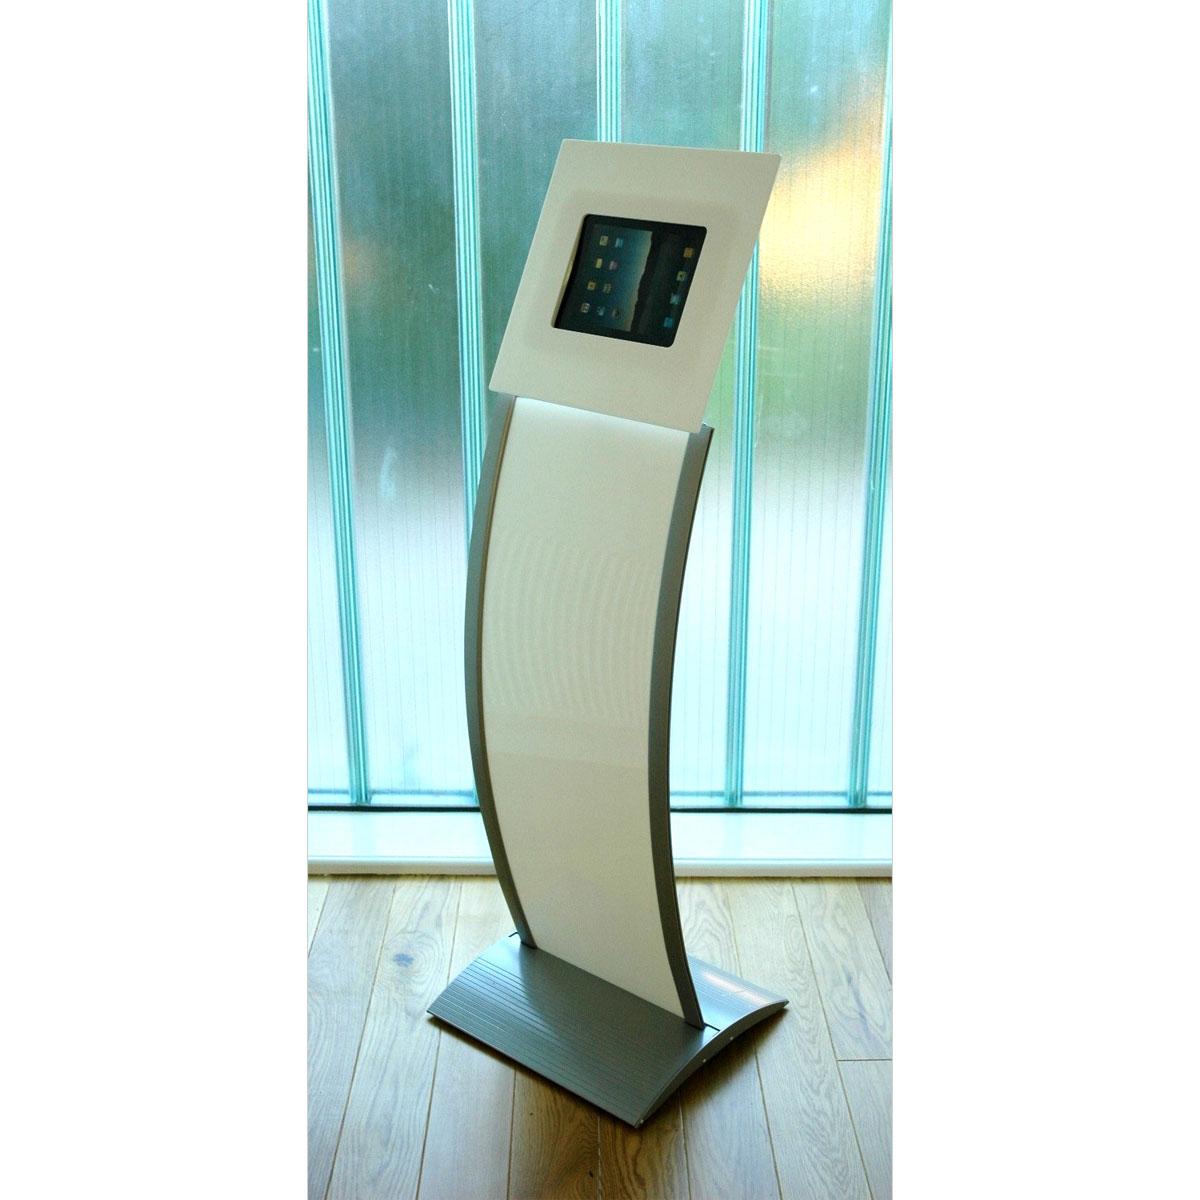 Kiosk Tablet Display Stand Tablet Display Stands